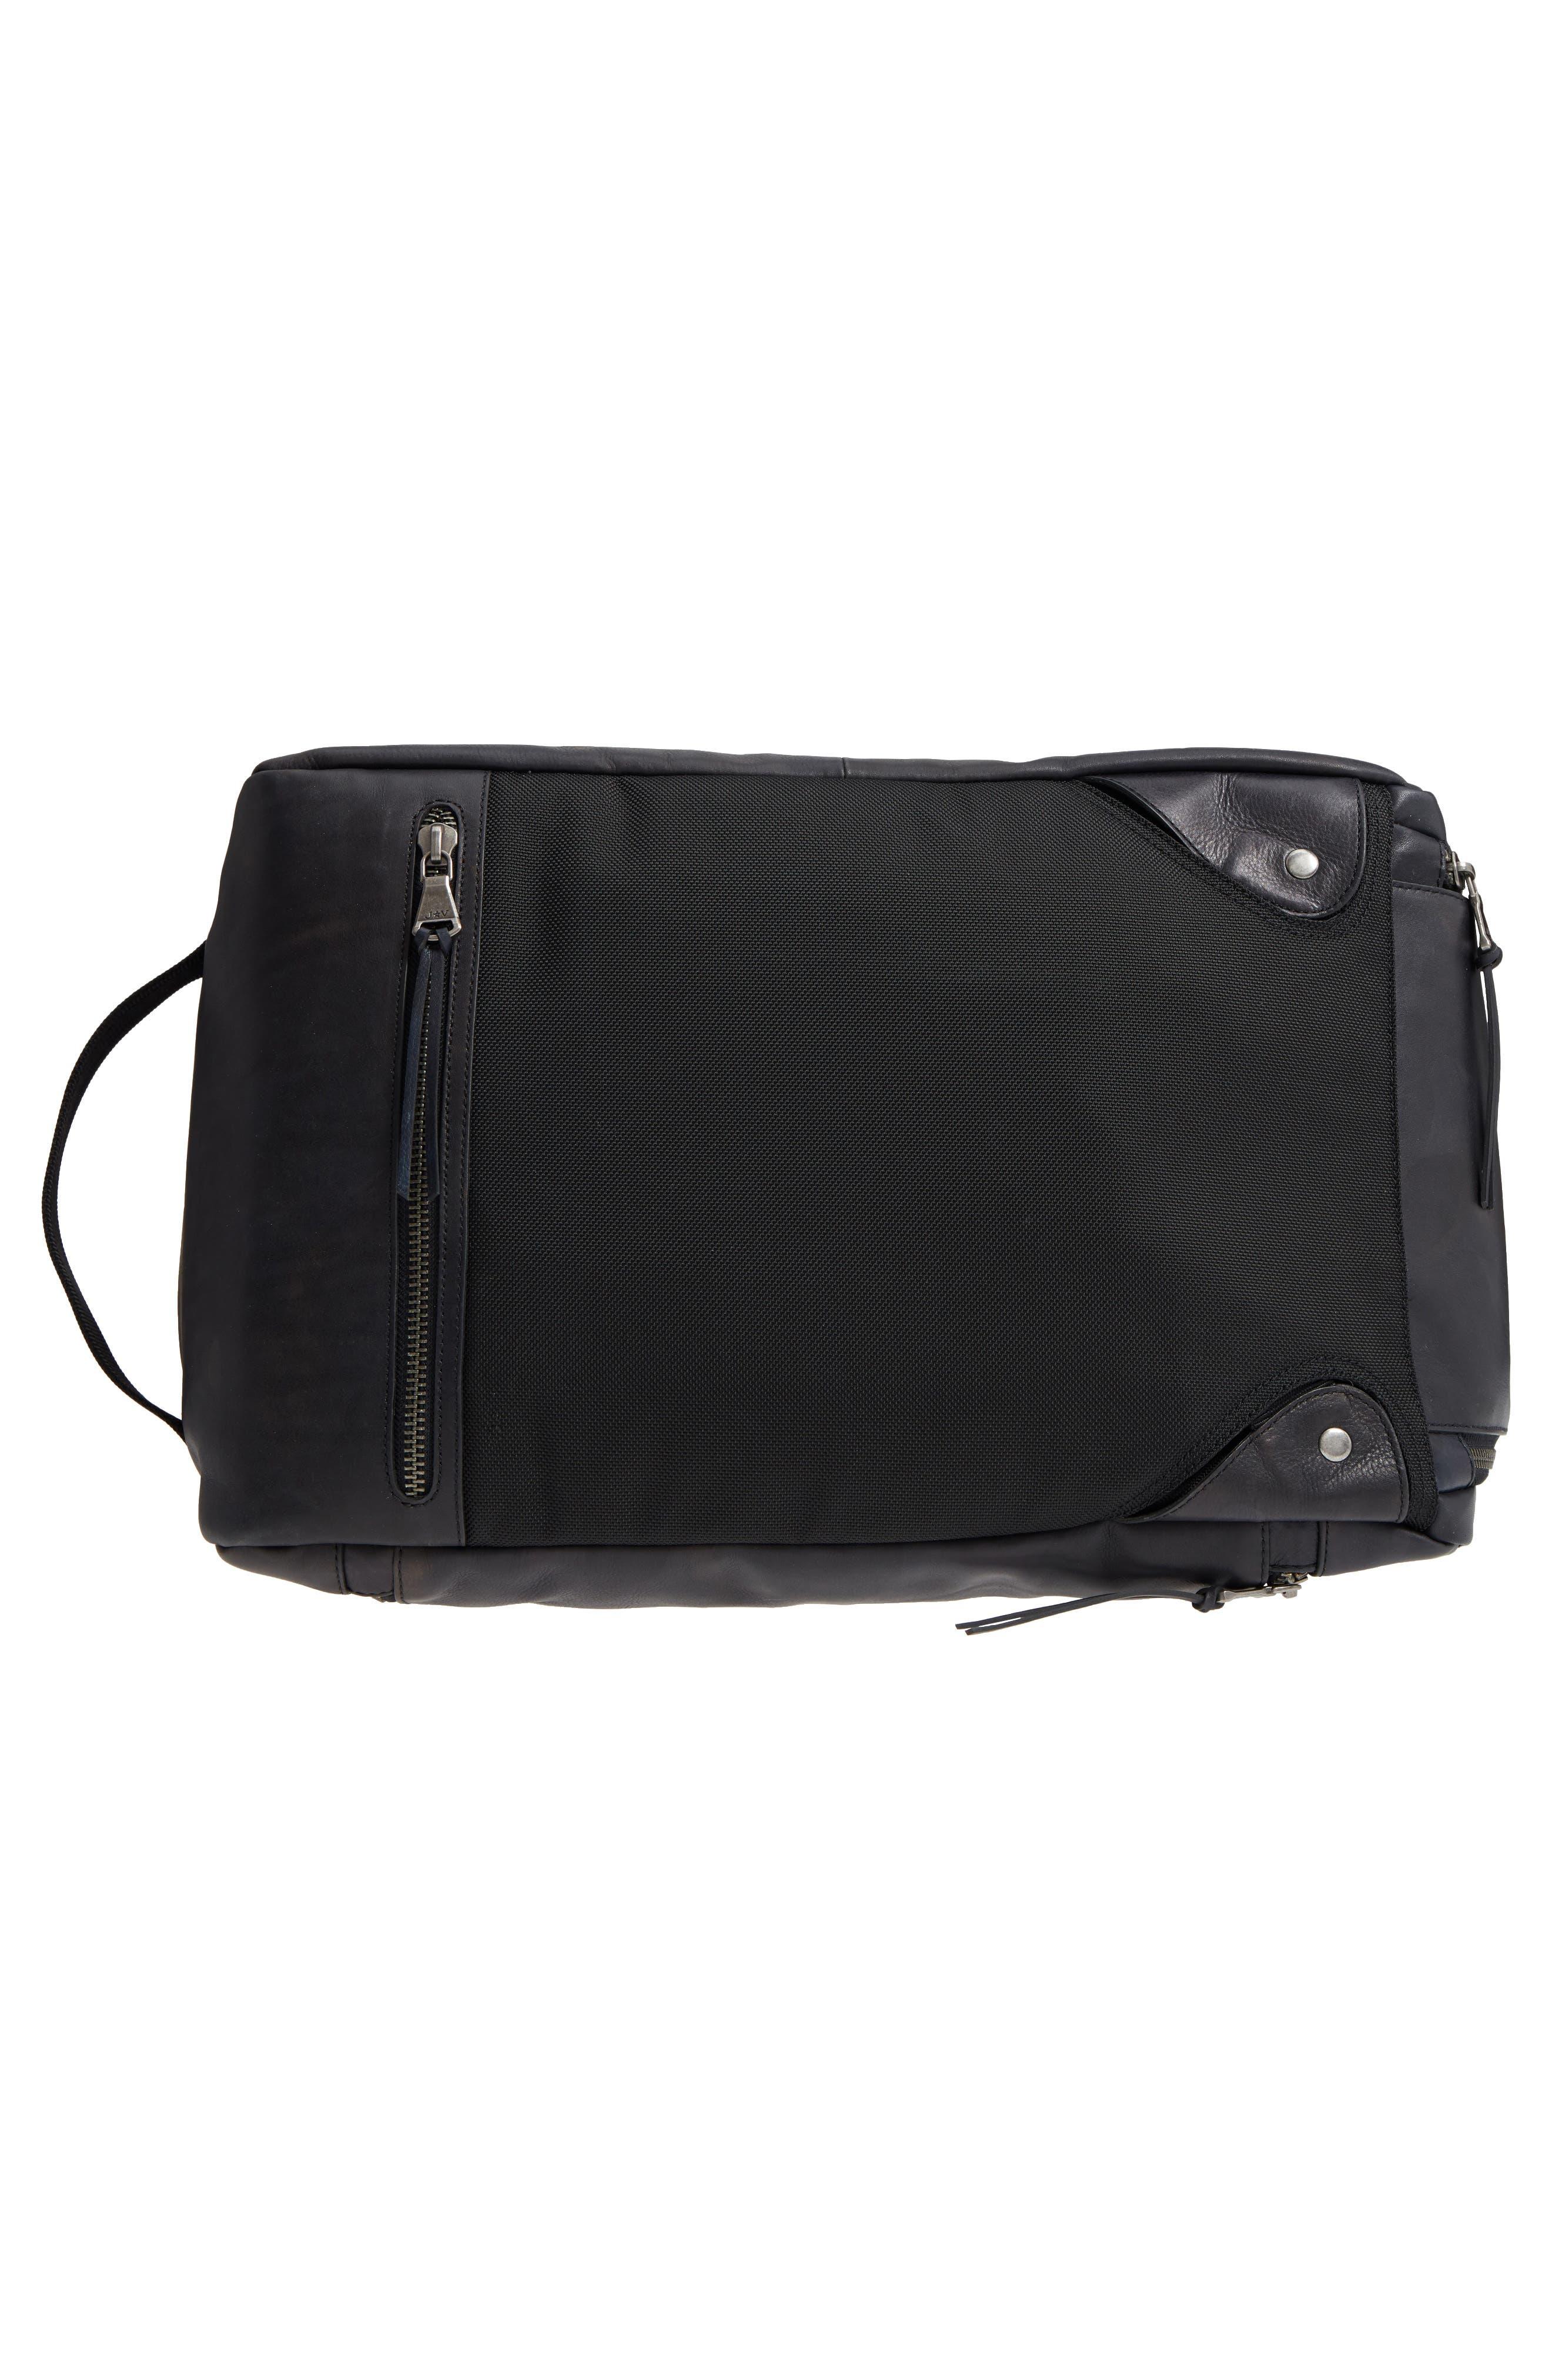 Brooklyn Suede Convertible Duffel Bag,                             Alternate thumbnail 14, color,